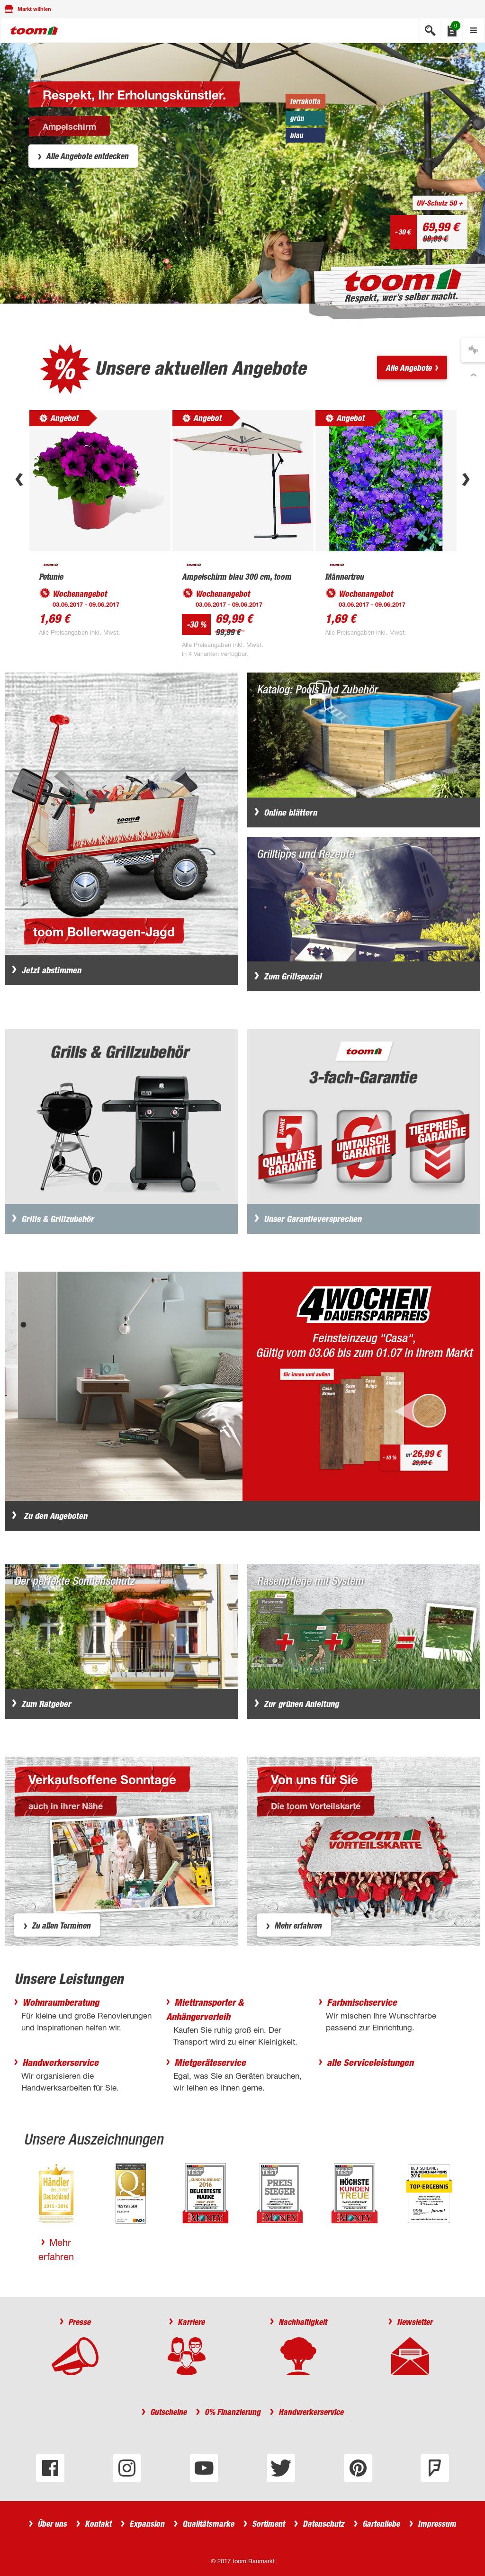 toom baumarkt competitors, revenue and employees - owler company profile